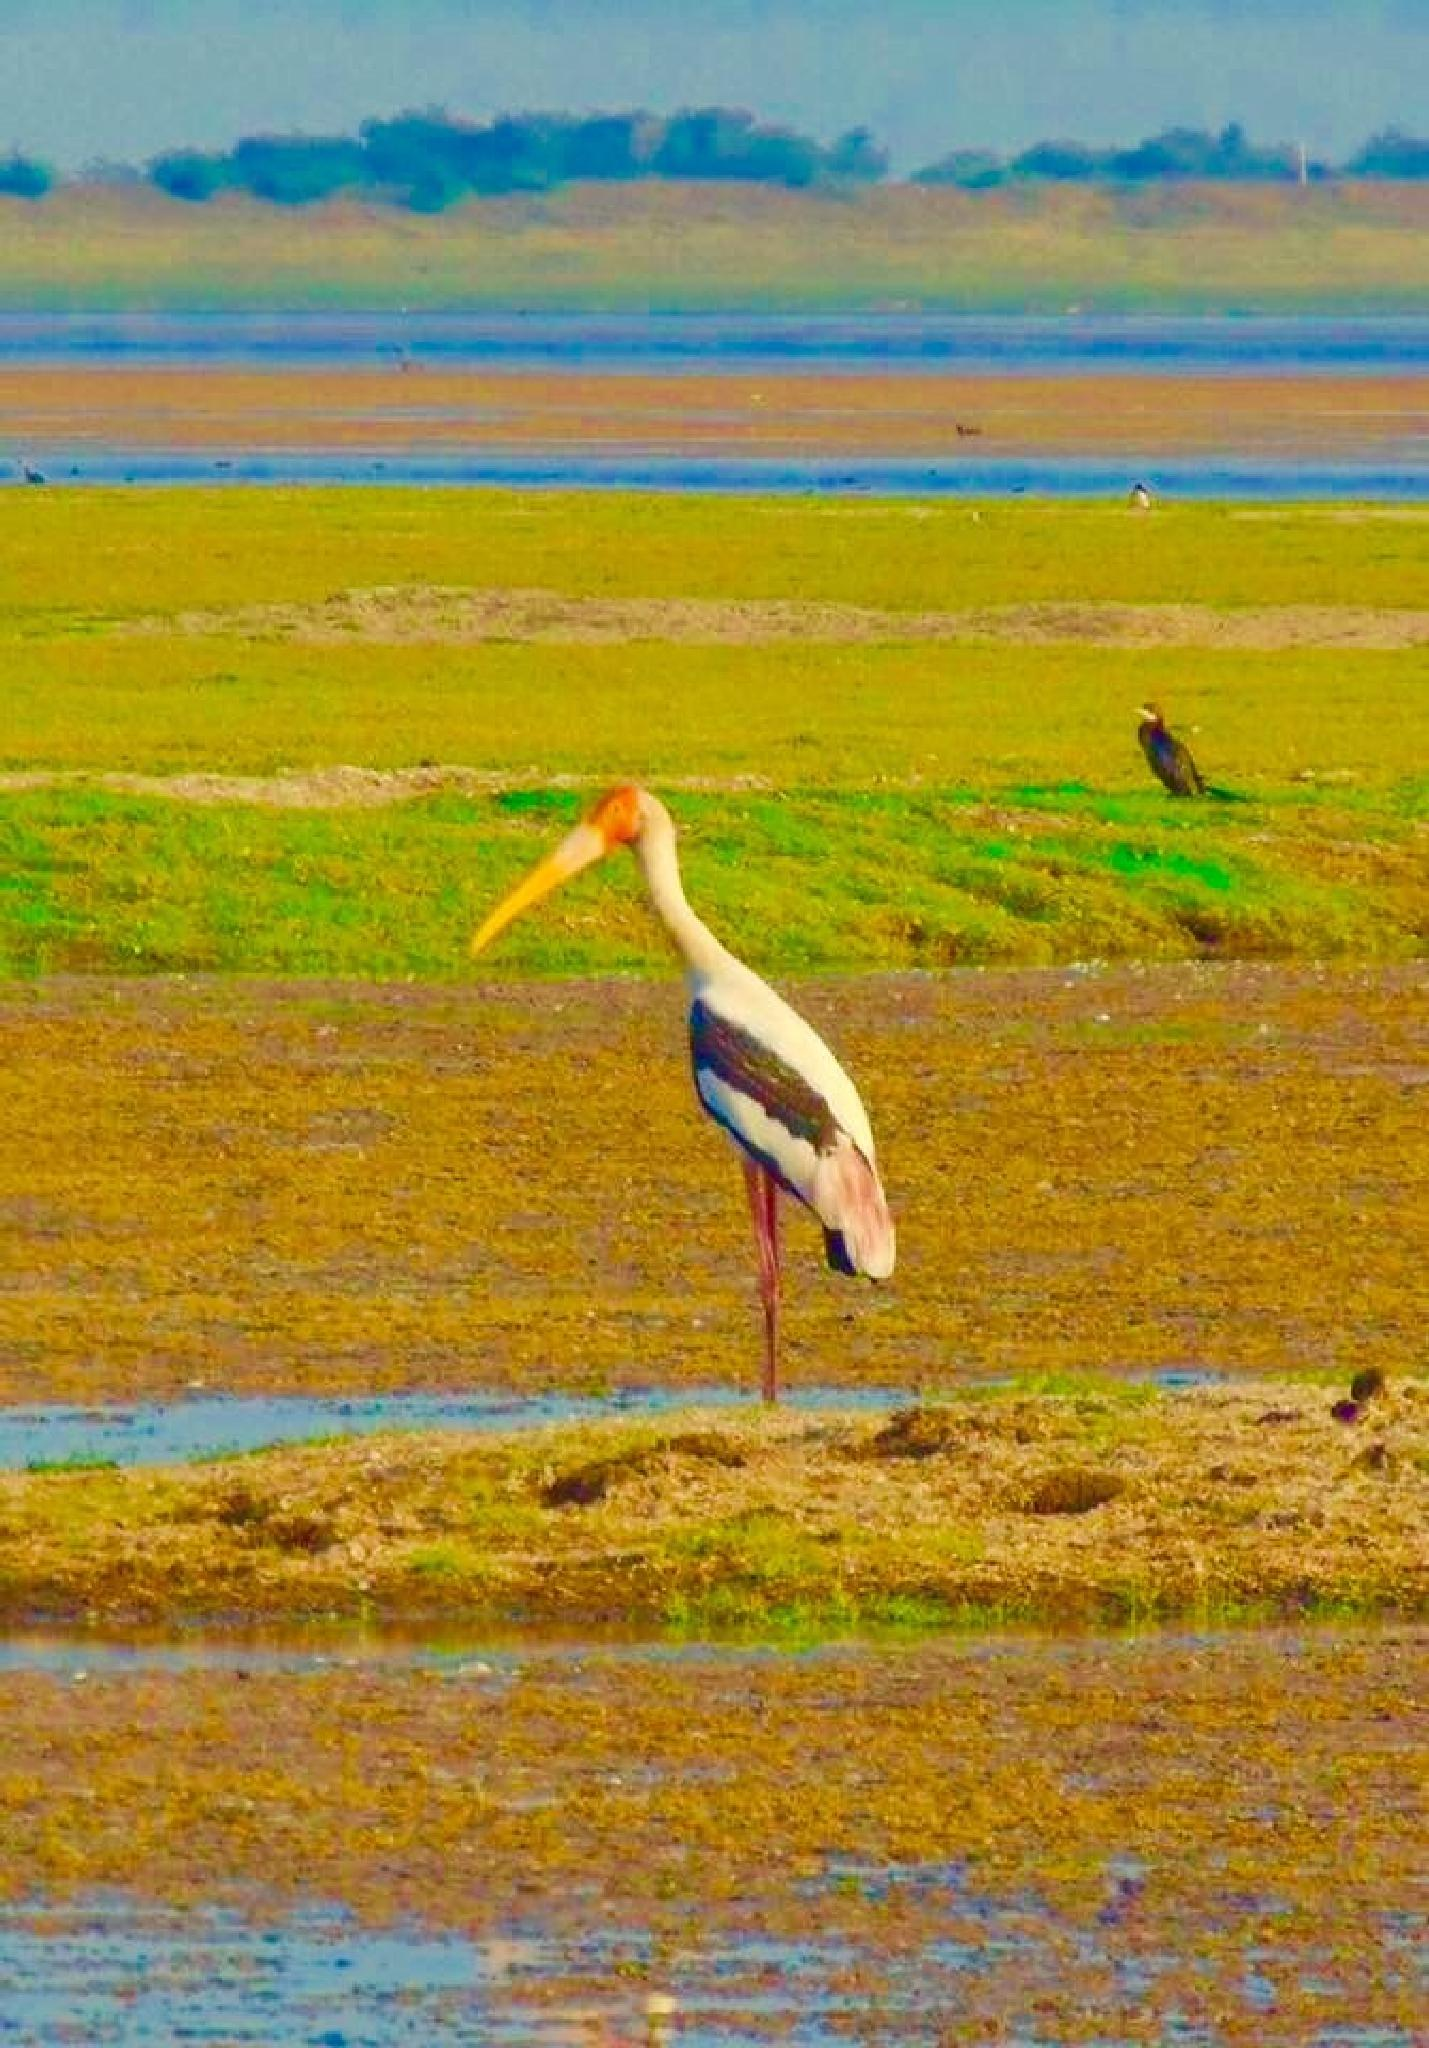 Painted stork 2 by Anjana Chakraborti